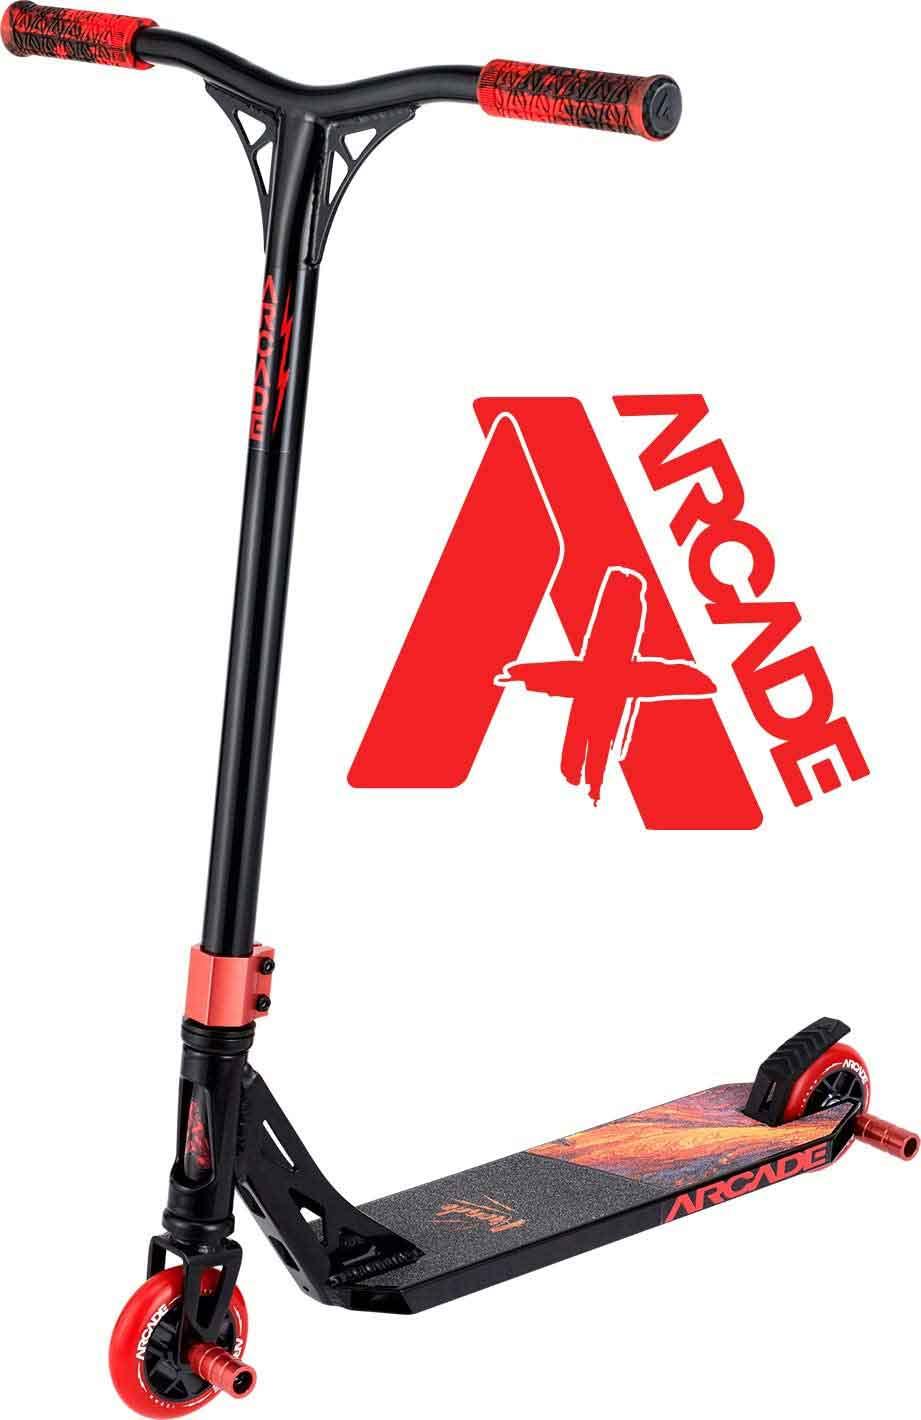 5.Arcade